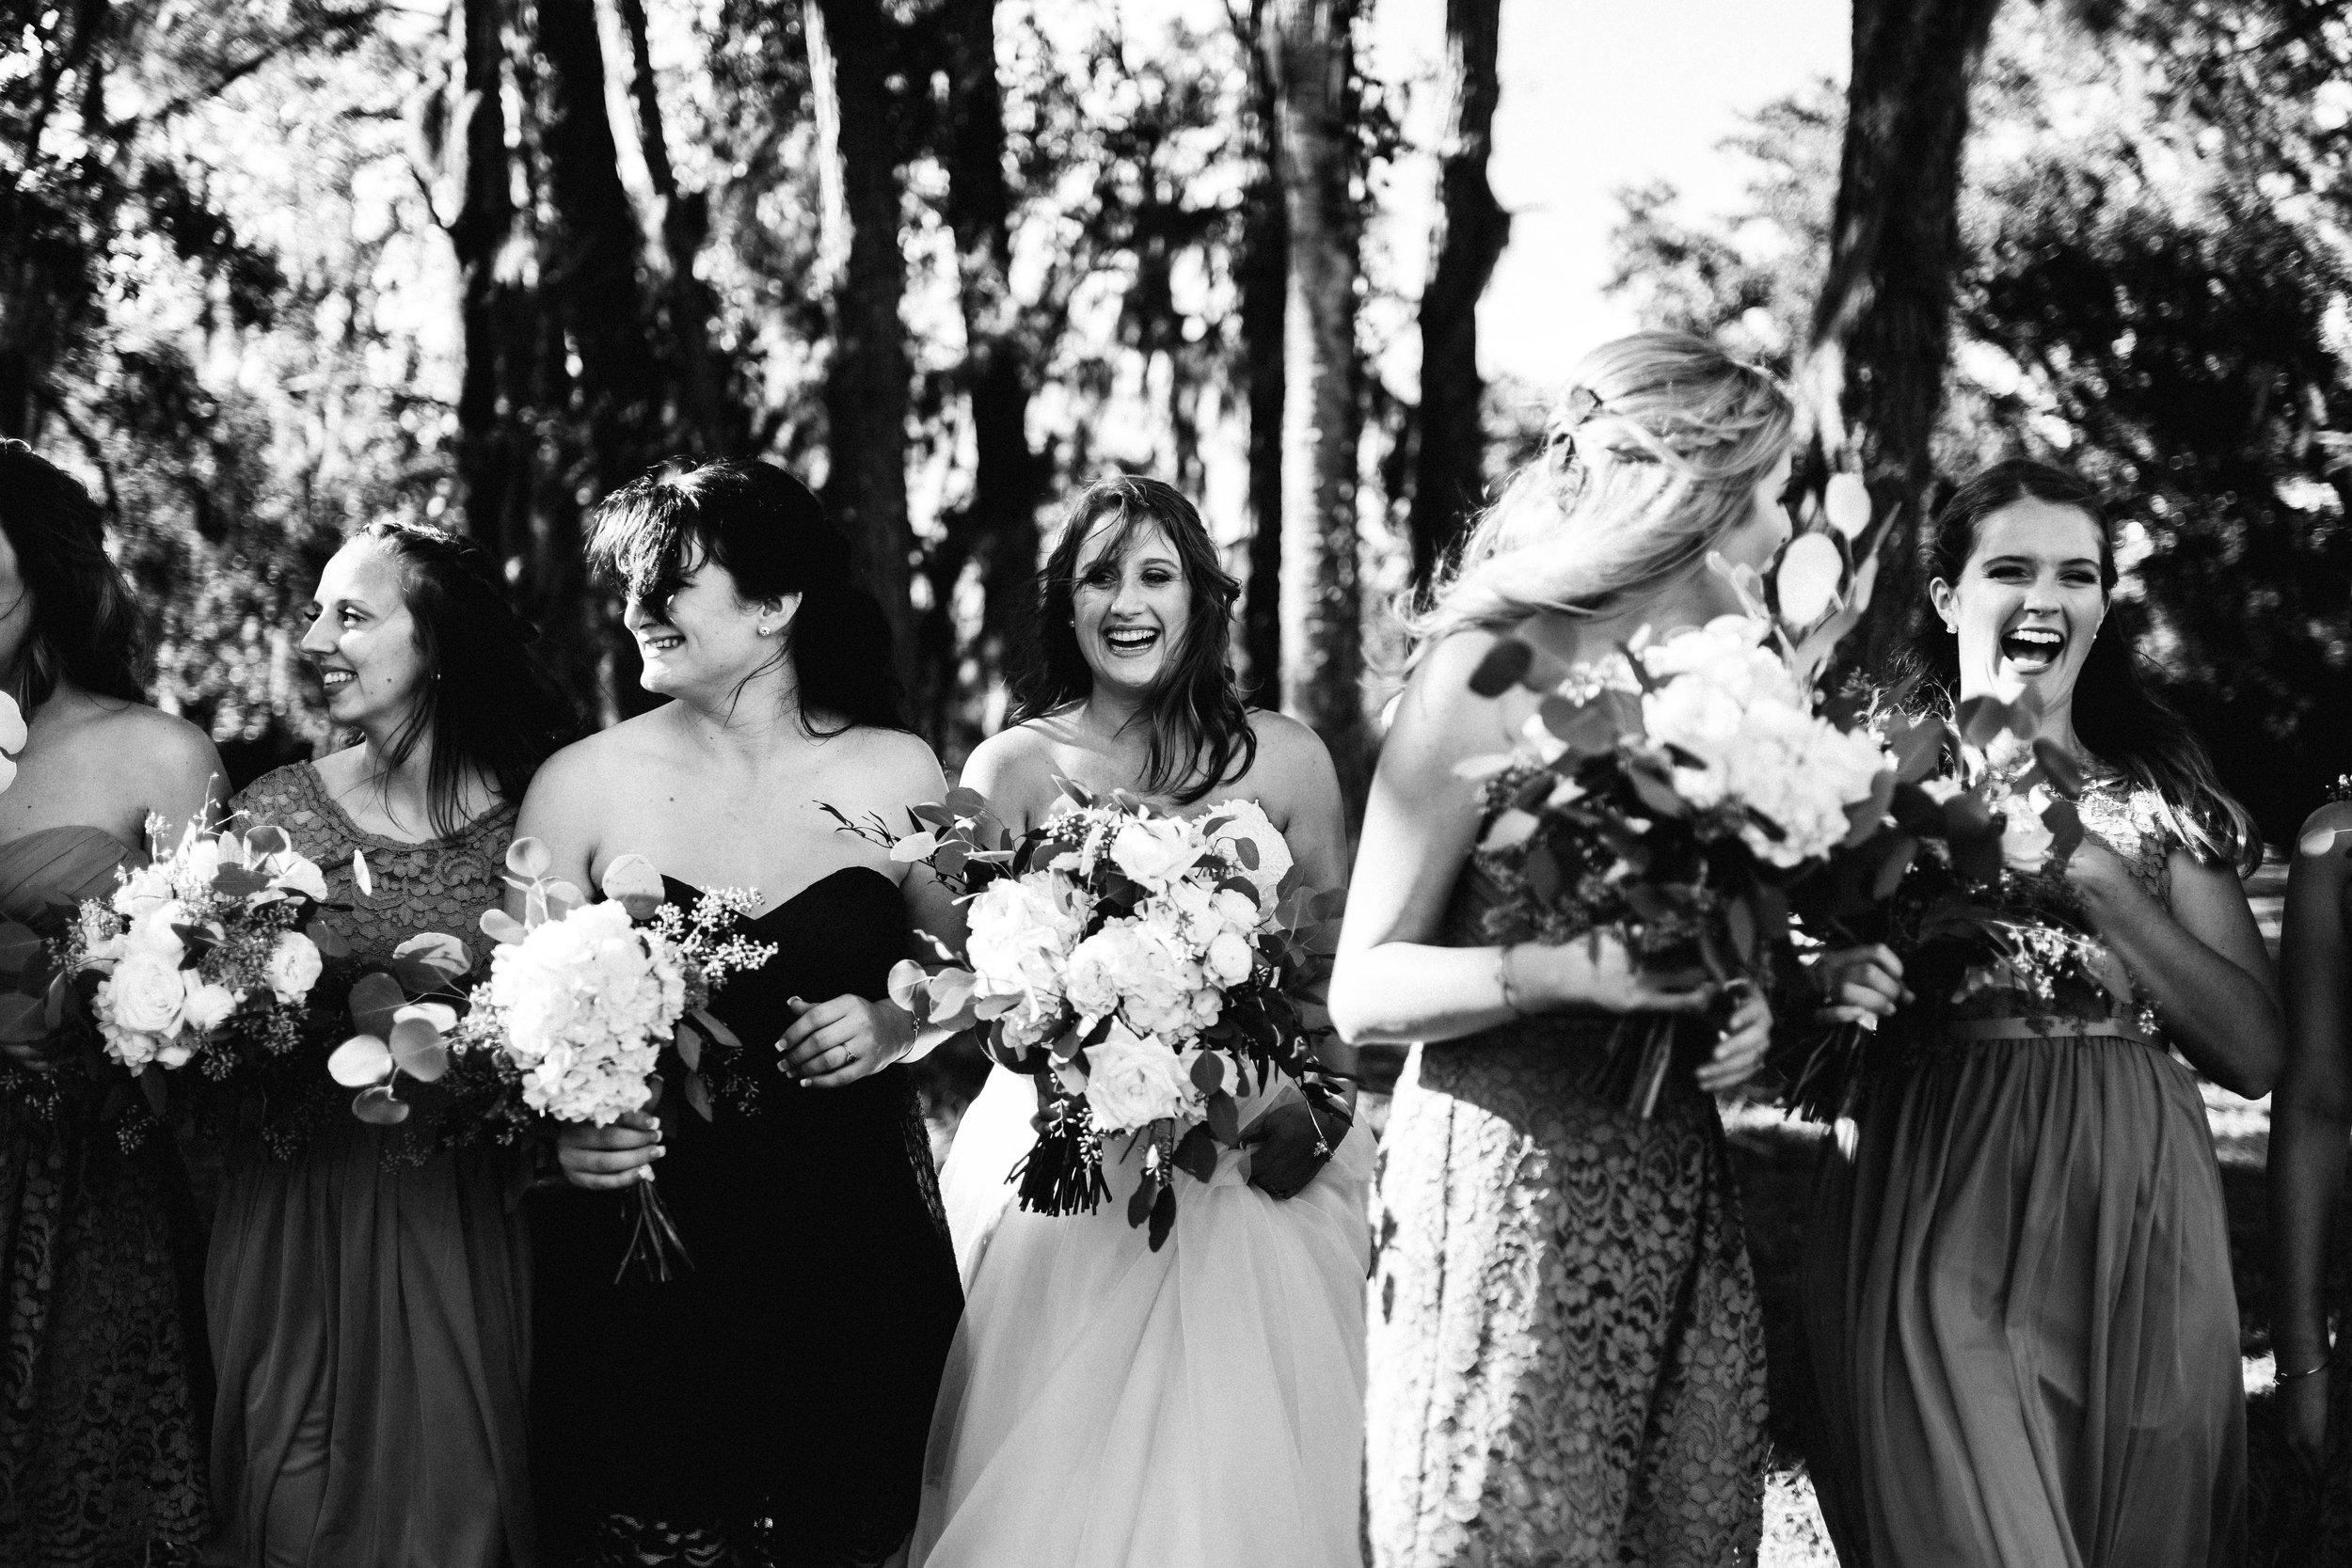 2017.10.14 Samantha and Matthew Crabtree Sarasota Wedding (282 of 708).jpg